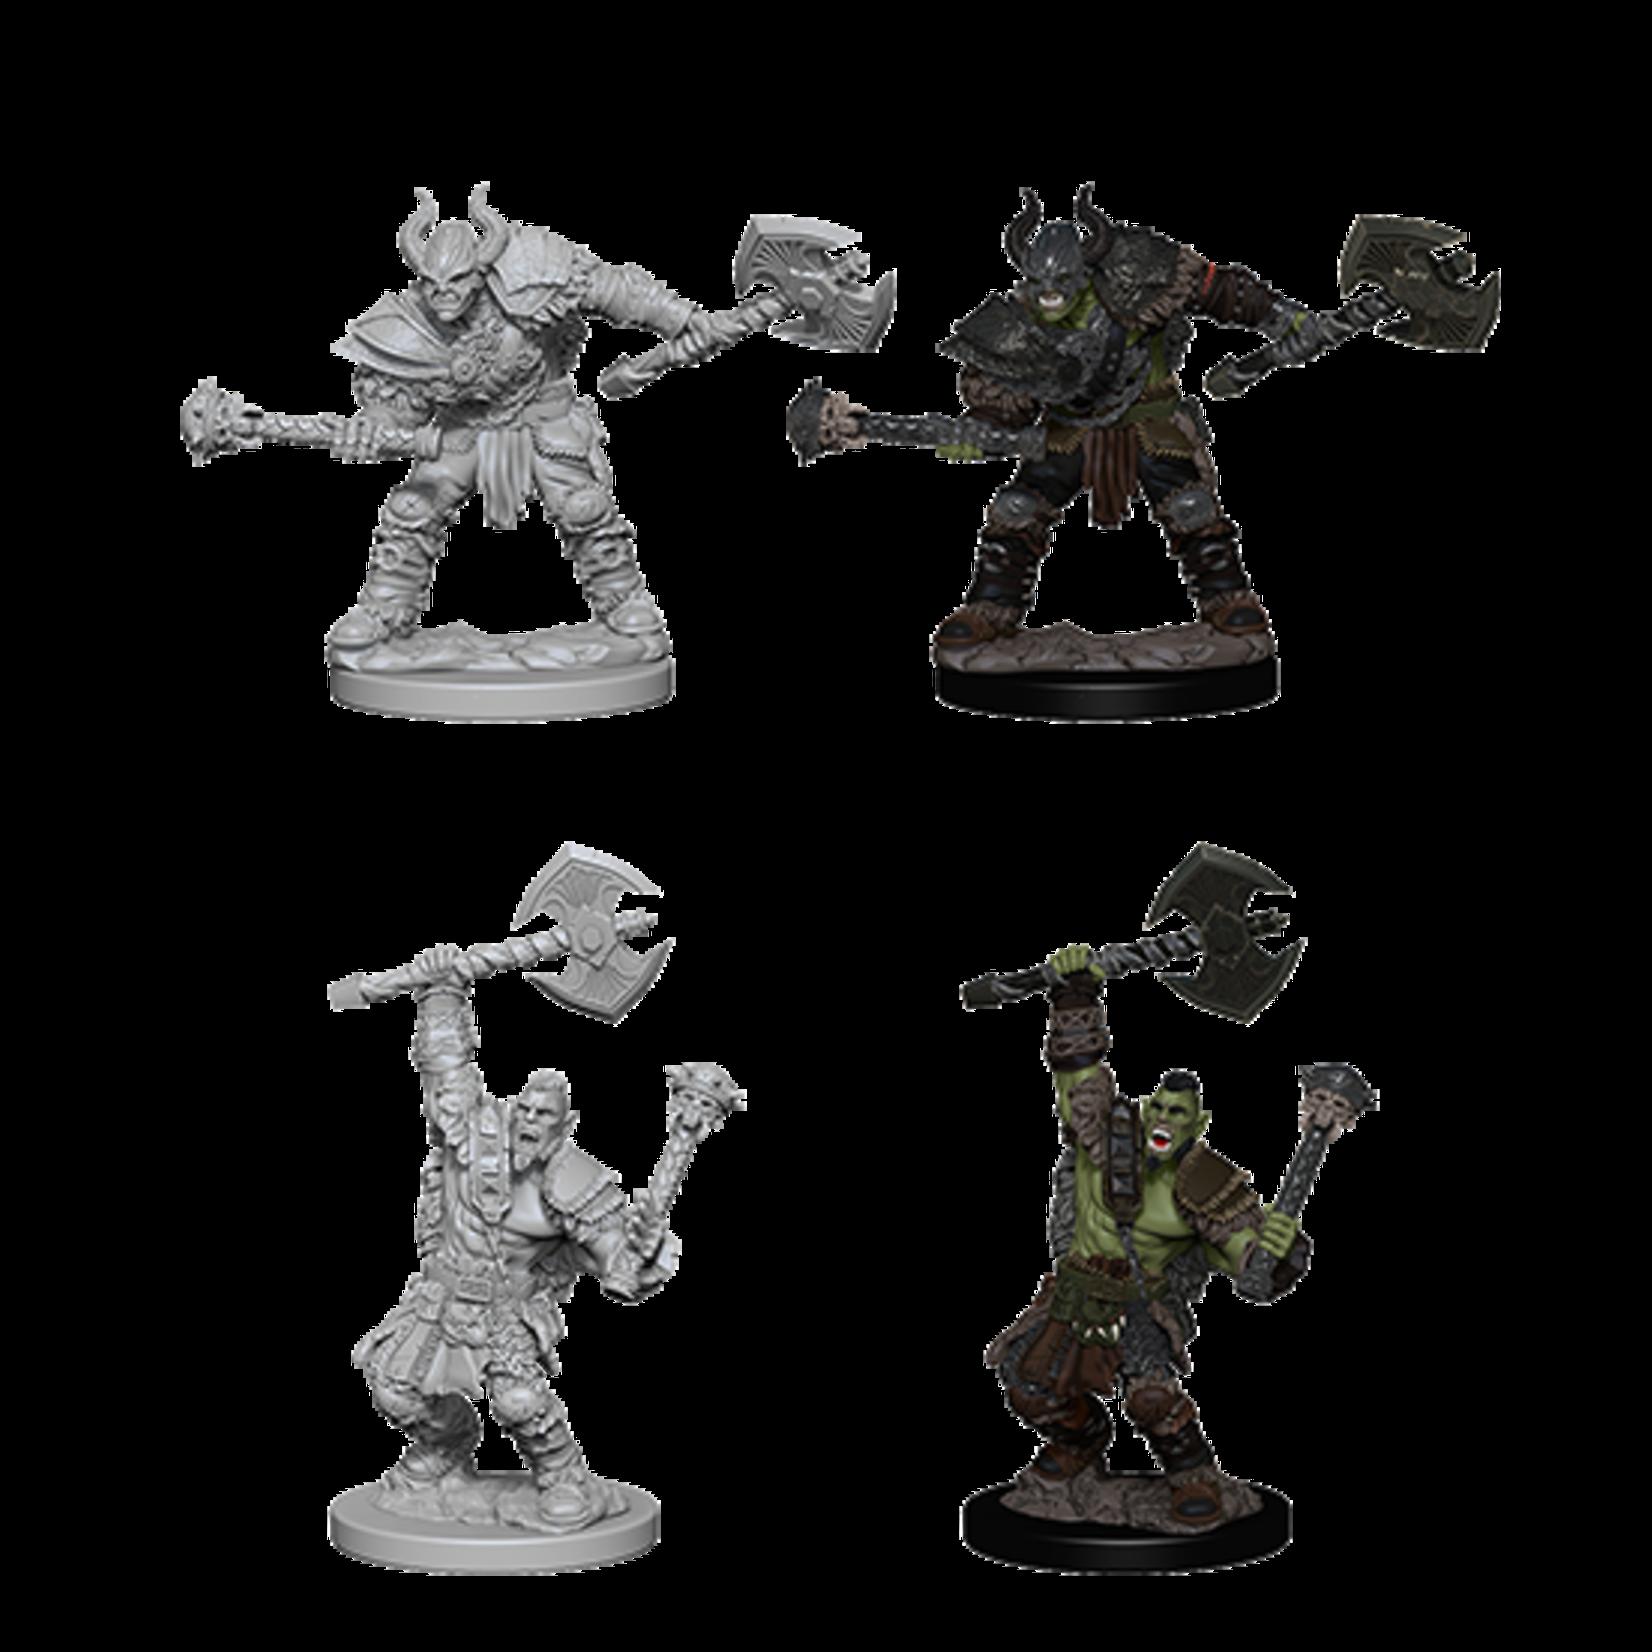 WizKids Pathfinder Deep Cuts Unpainted Miniatures: W3 Half-Orc Male Barbarian